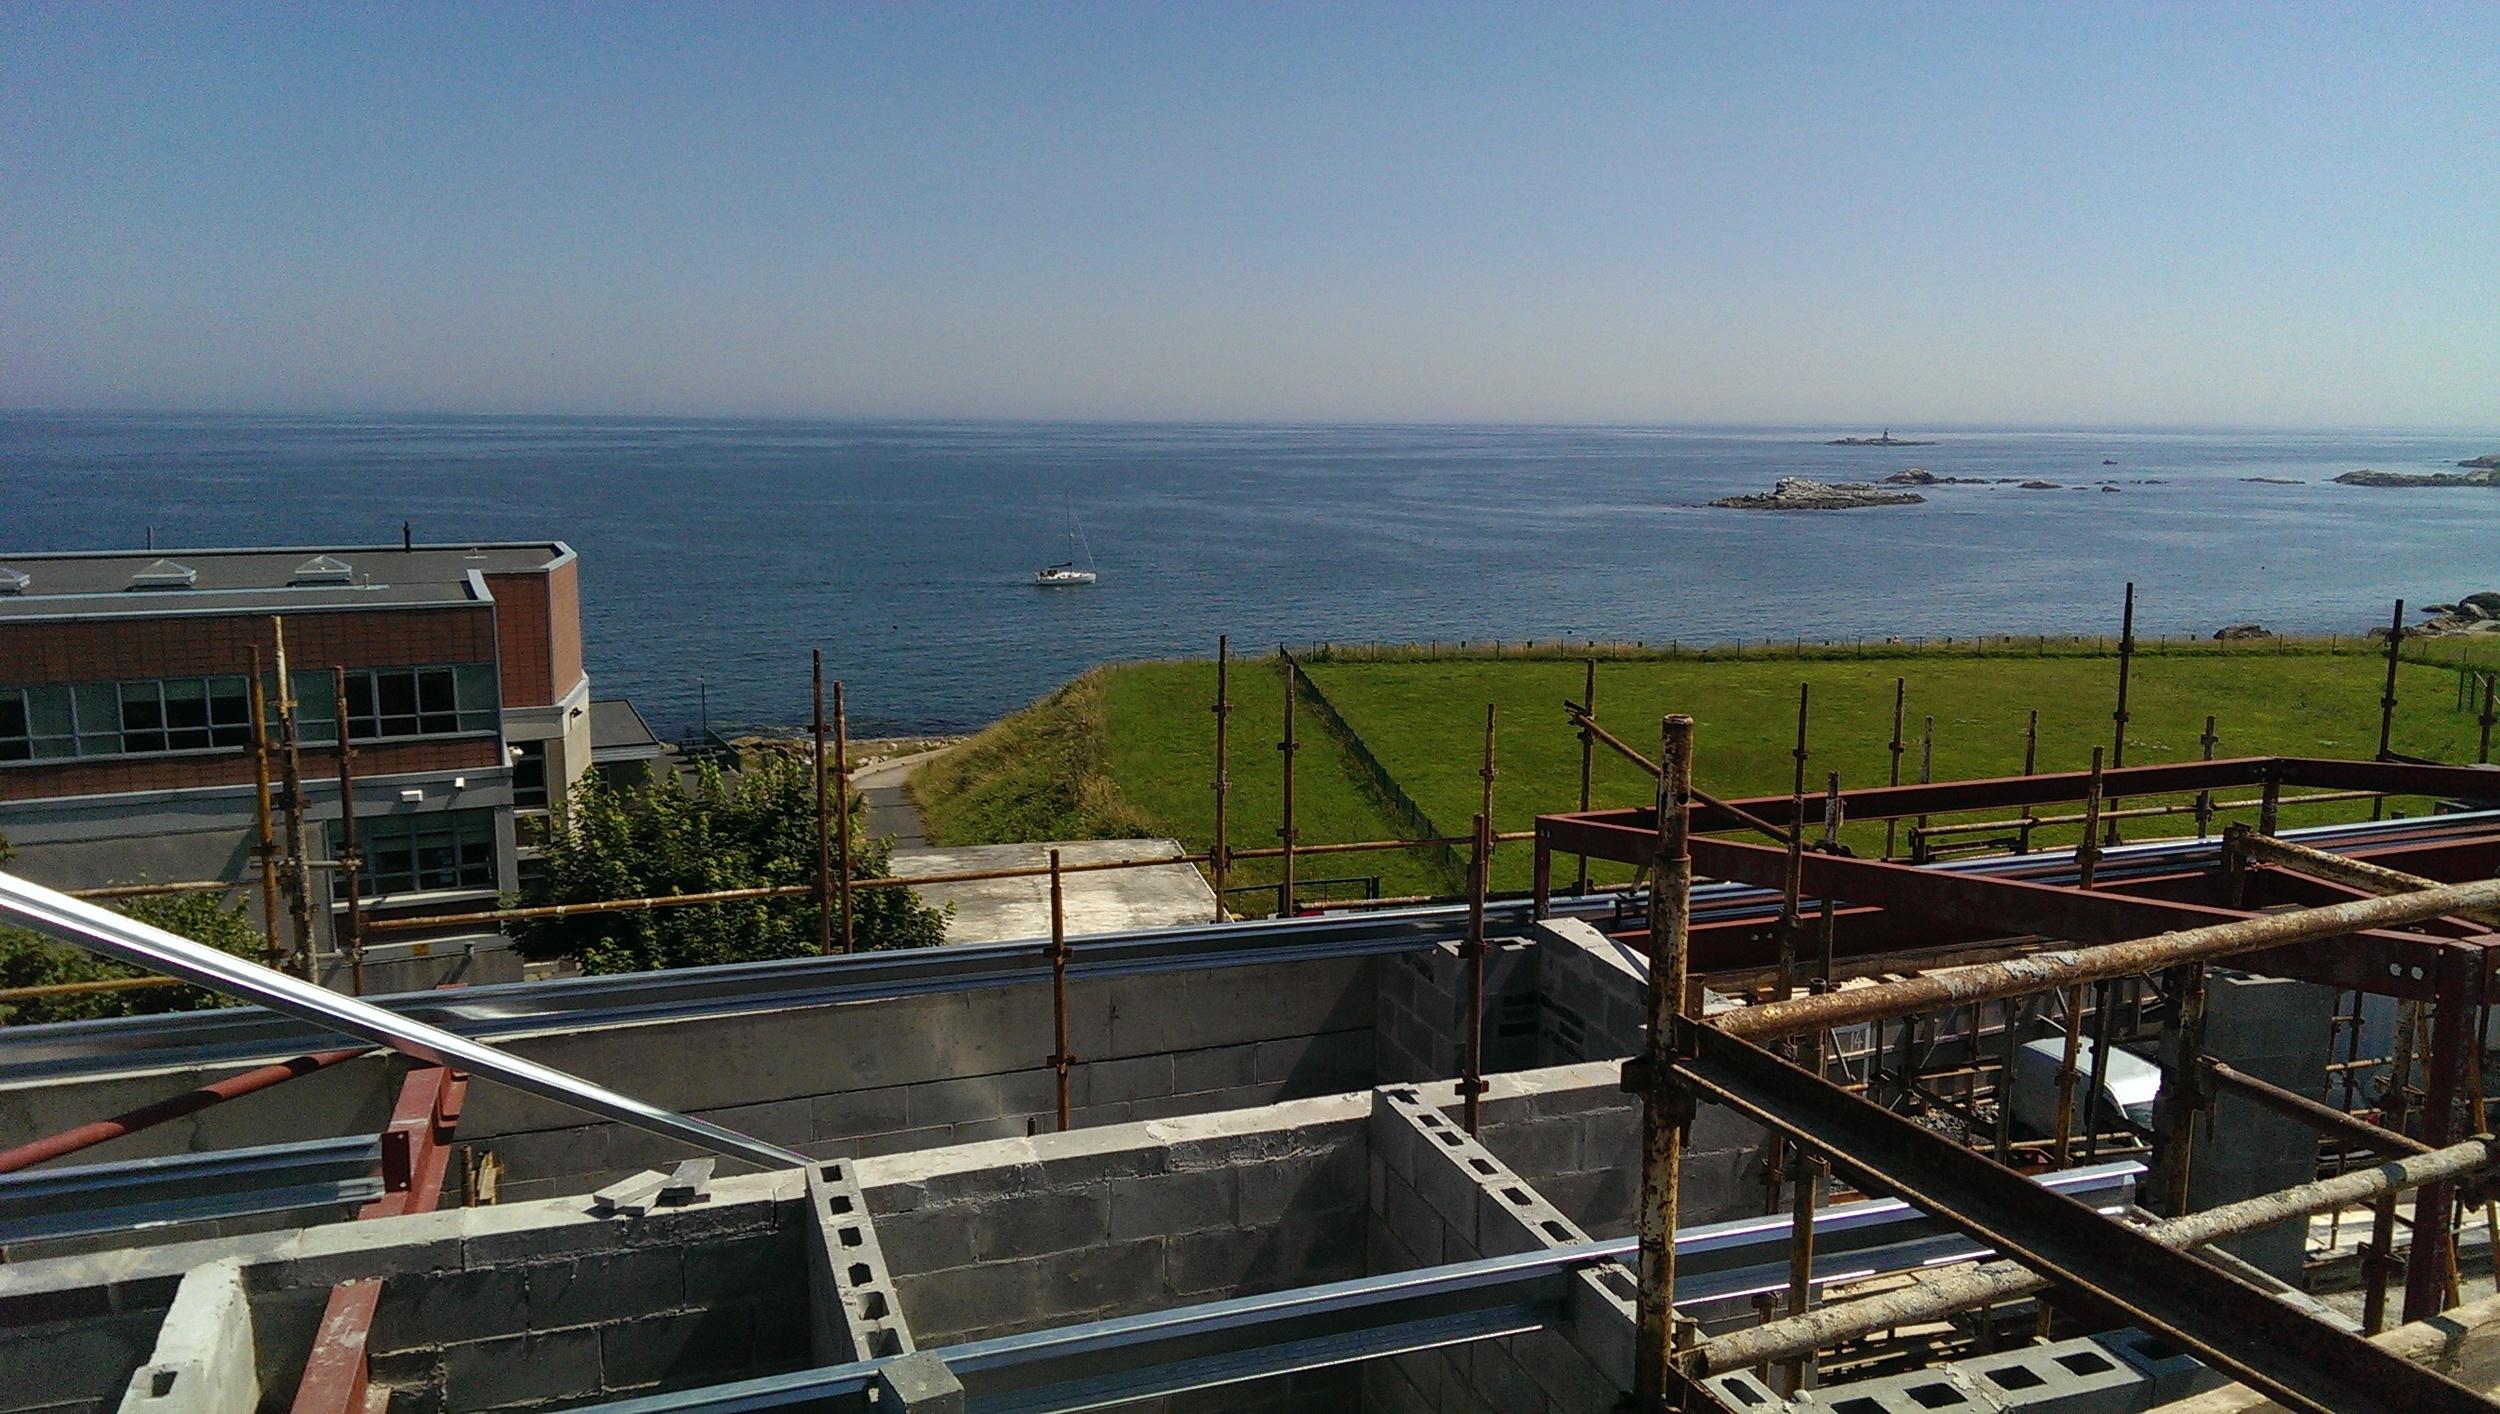 View of Dalkey Island